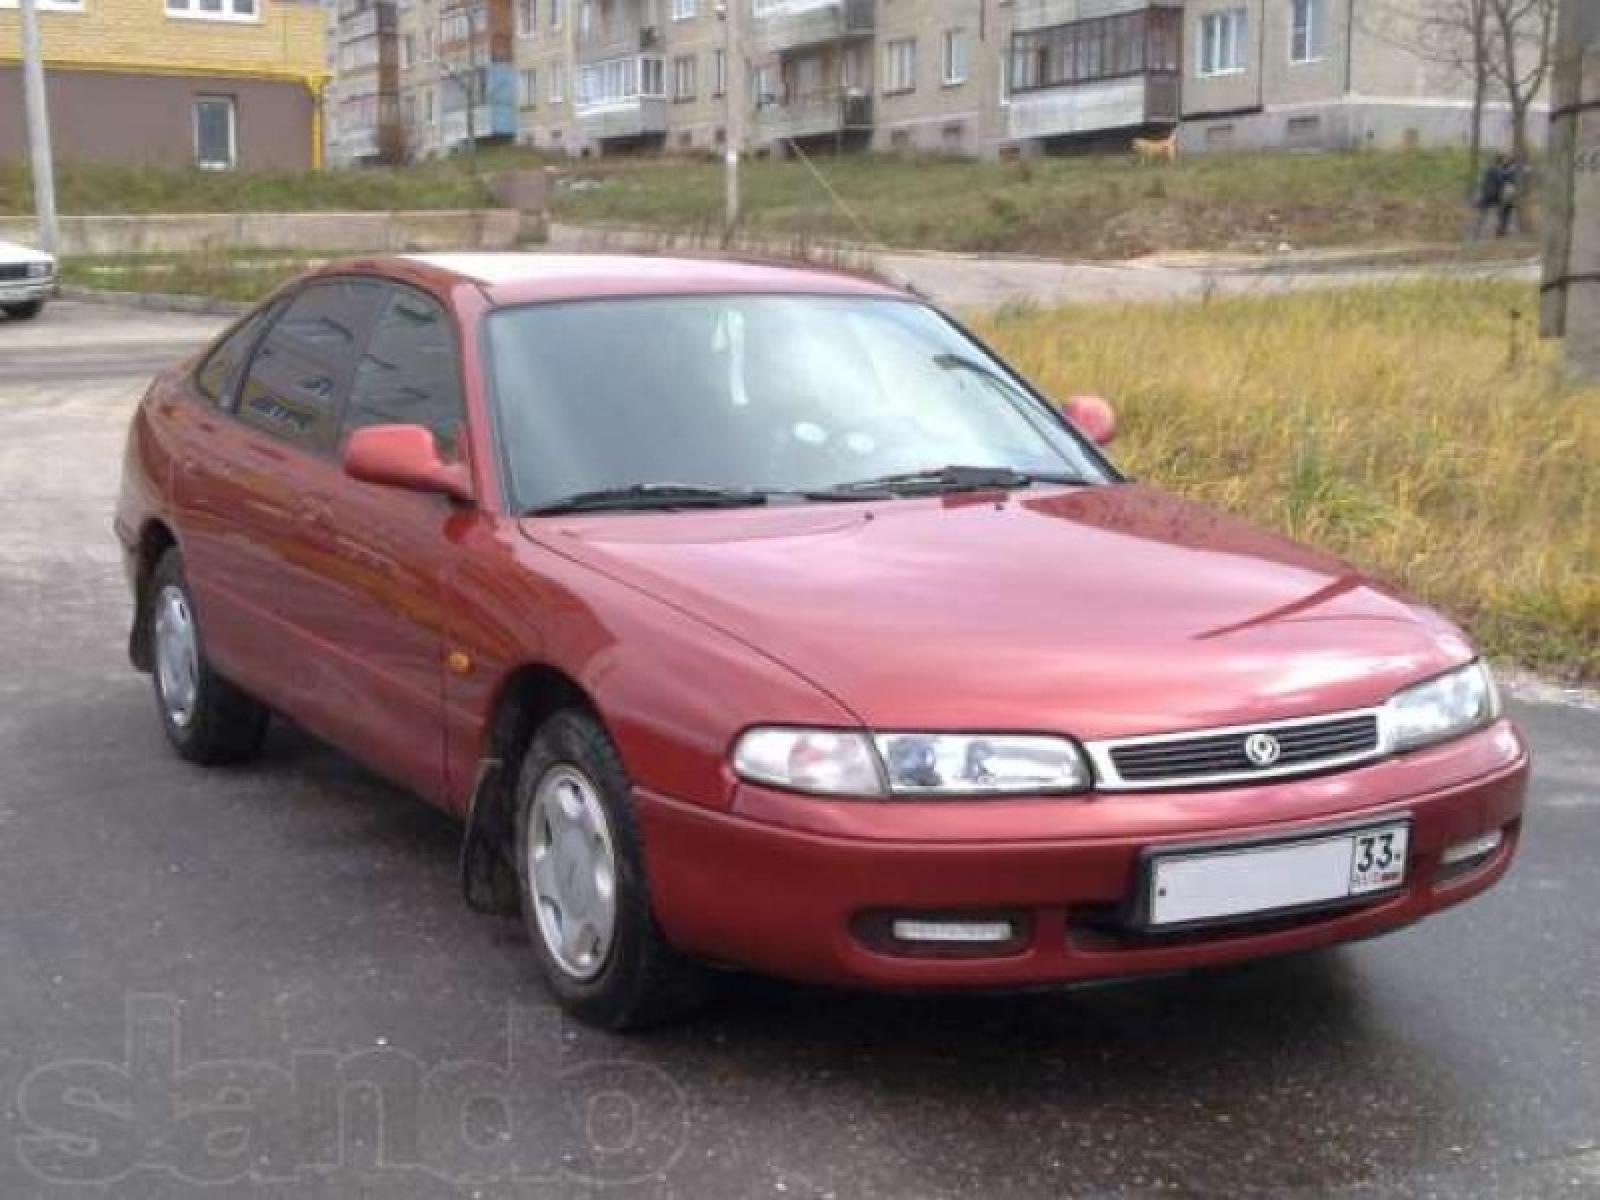 1993 Mazda 626 Information And Photos Zombiedrive 929 Engine Diagram 800 1024 1280 1600 Origin